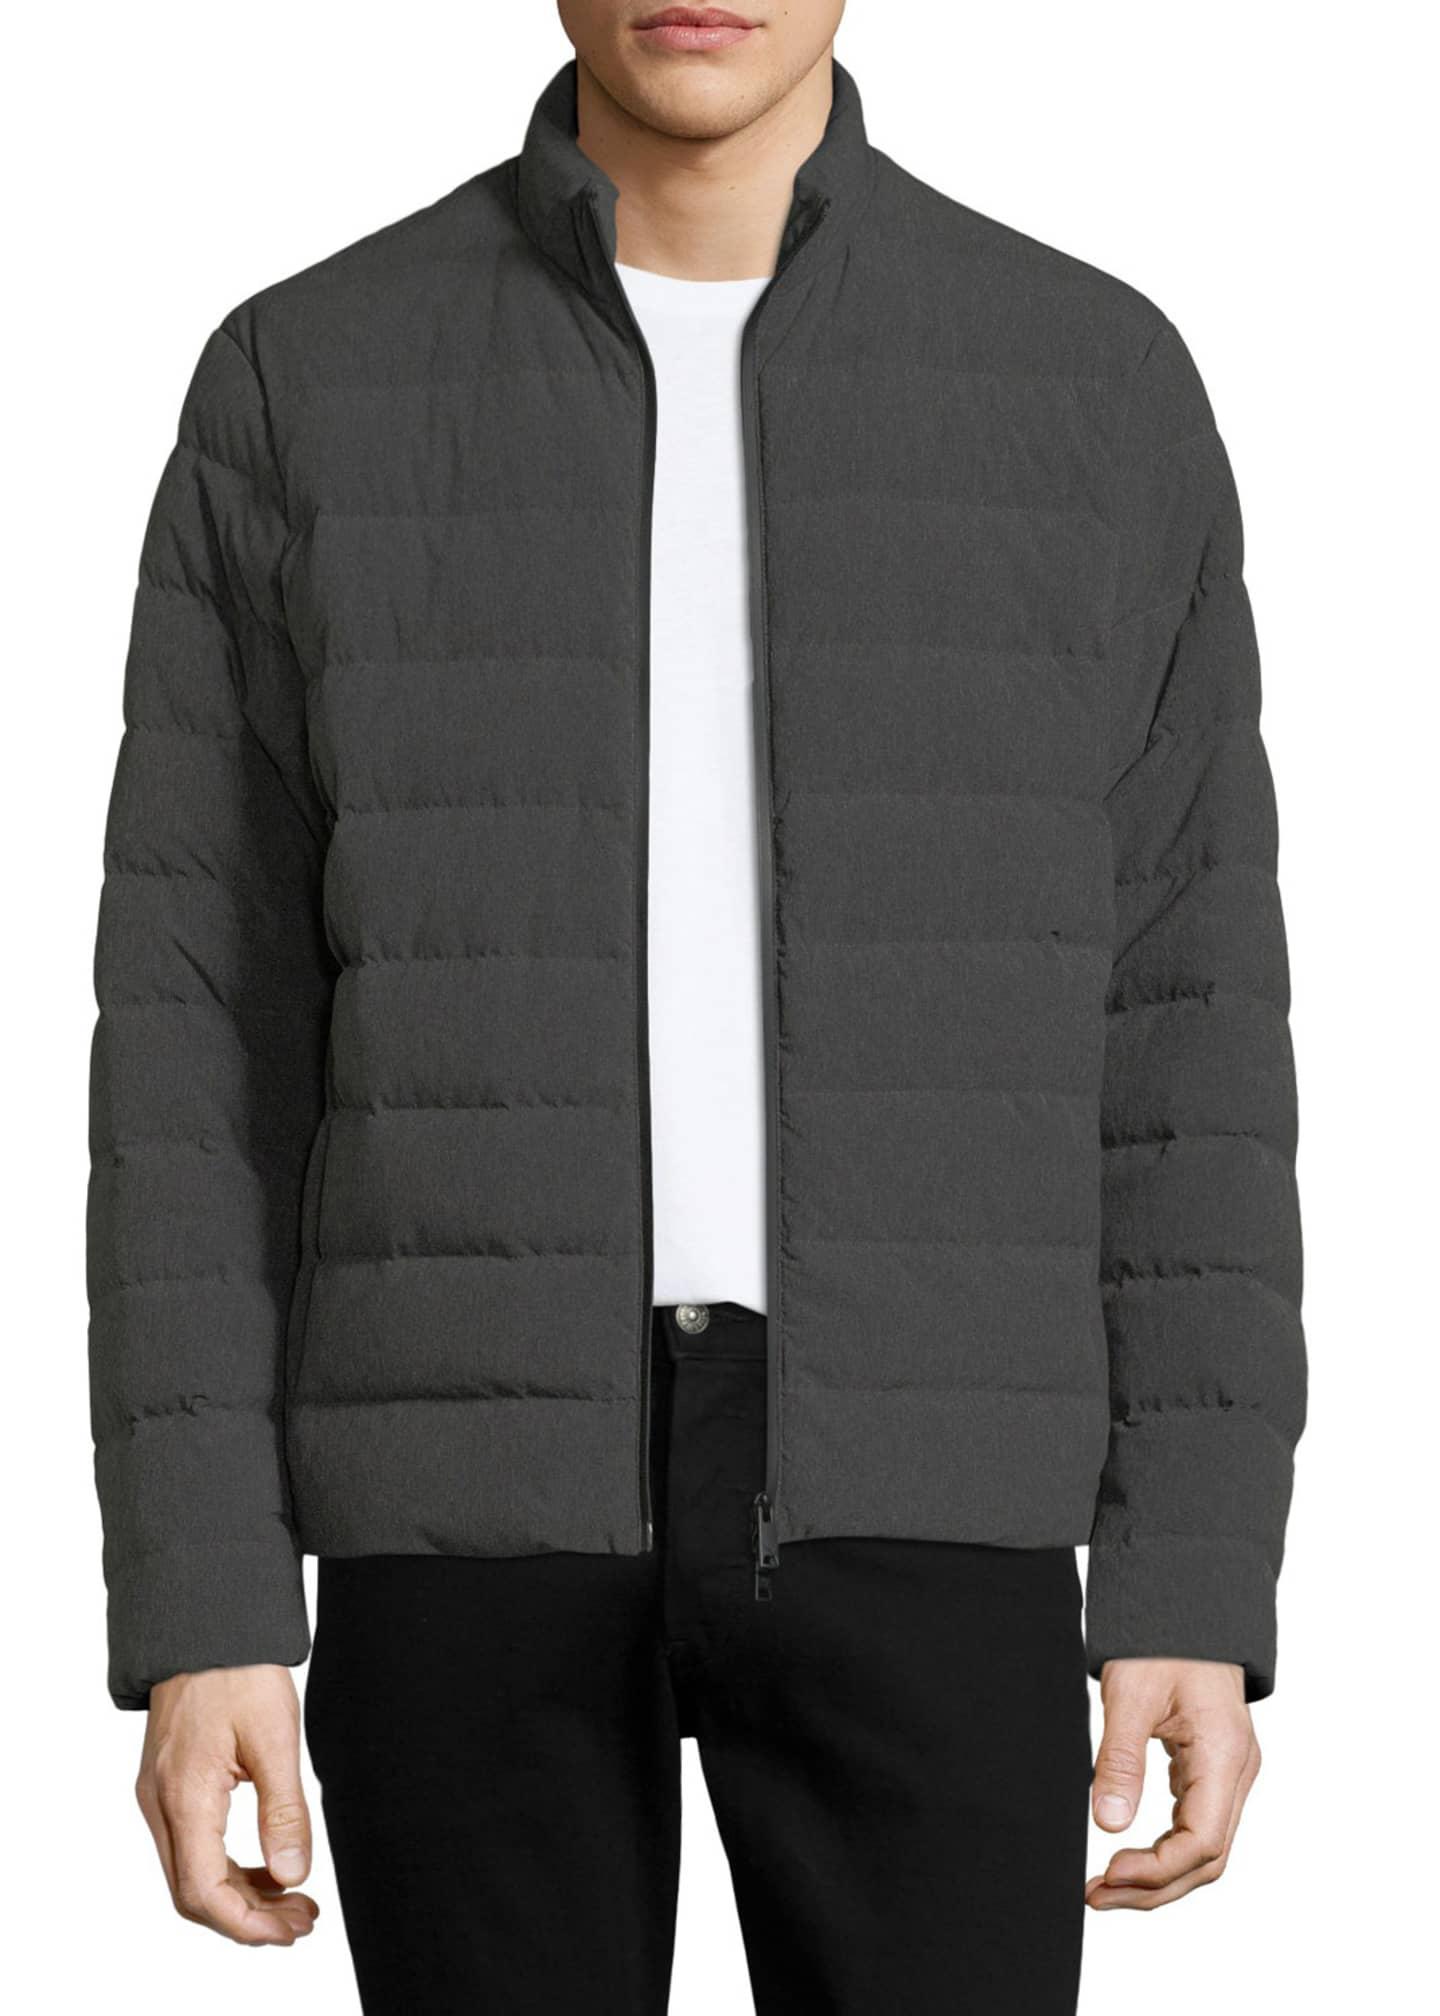 Emporio Armani Men's Polyester Melange Puffer Jacket